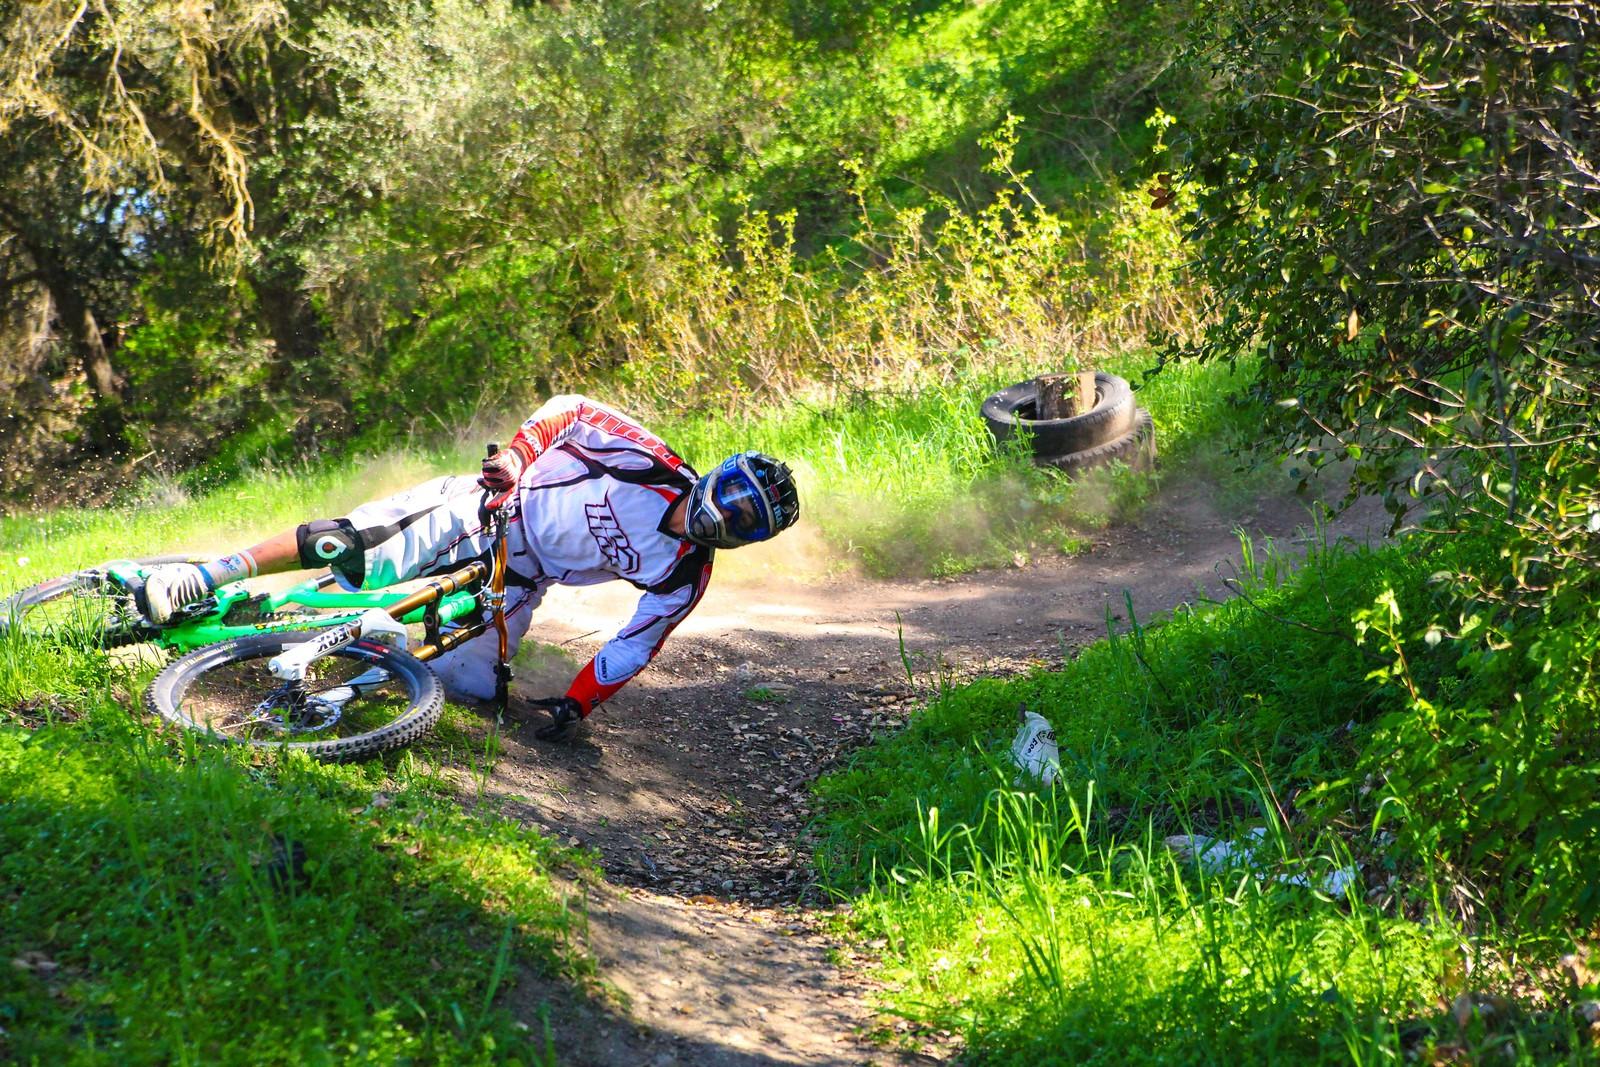 IMG 3090 - GnarHuck - Mountain Biking Pictures - Vital MTB